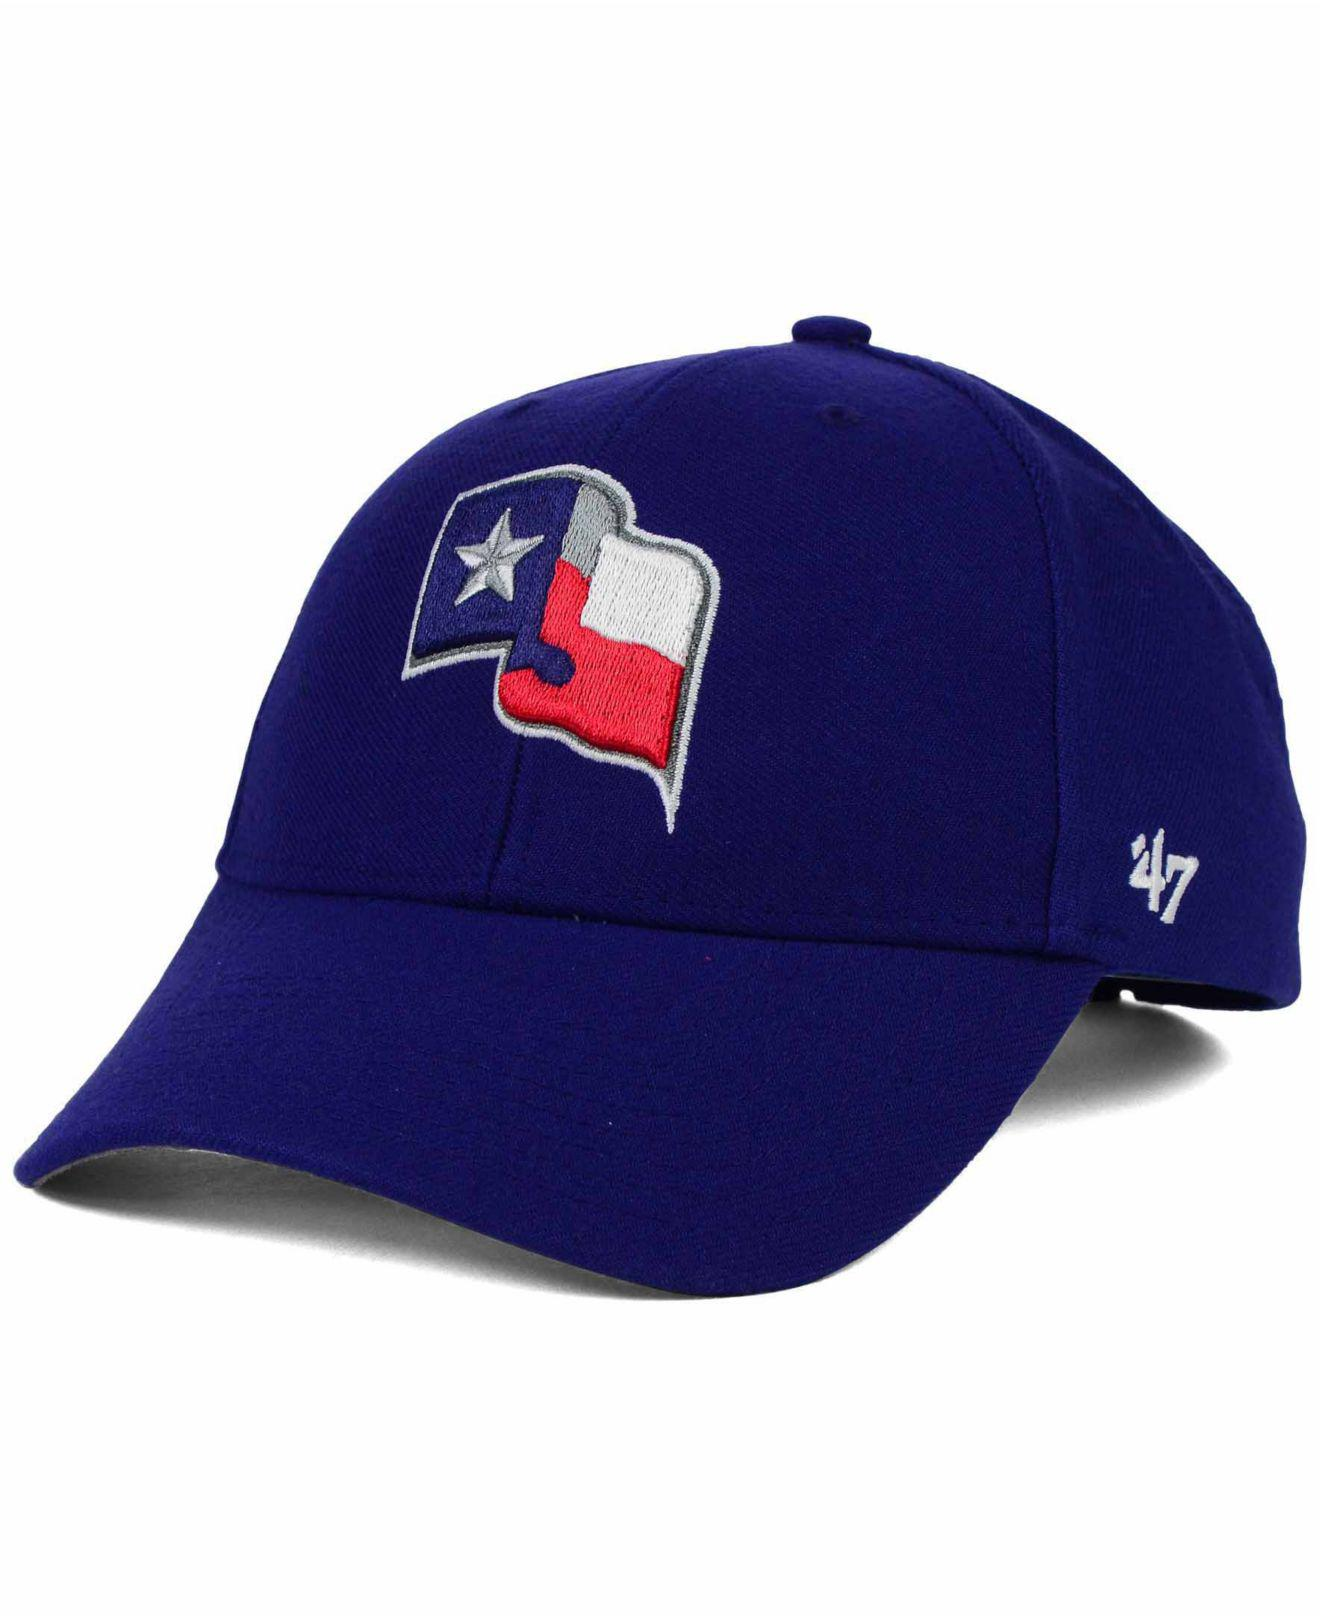 separation shoes 0234f e16a4 47 Brand. Men s Blue Texas Rangers Mvp Curved Cap